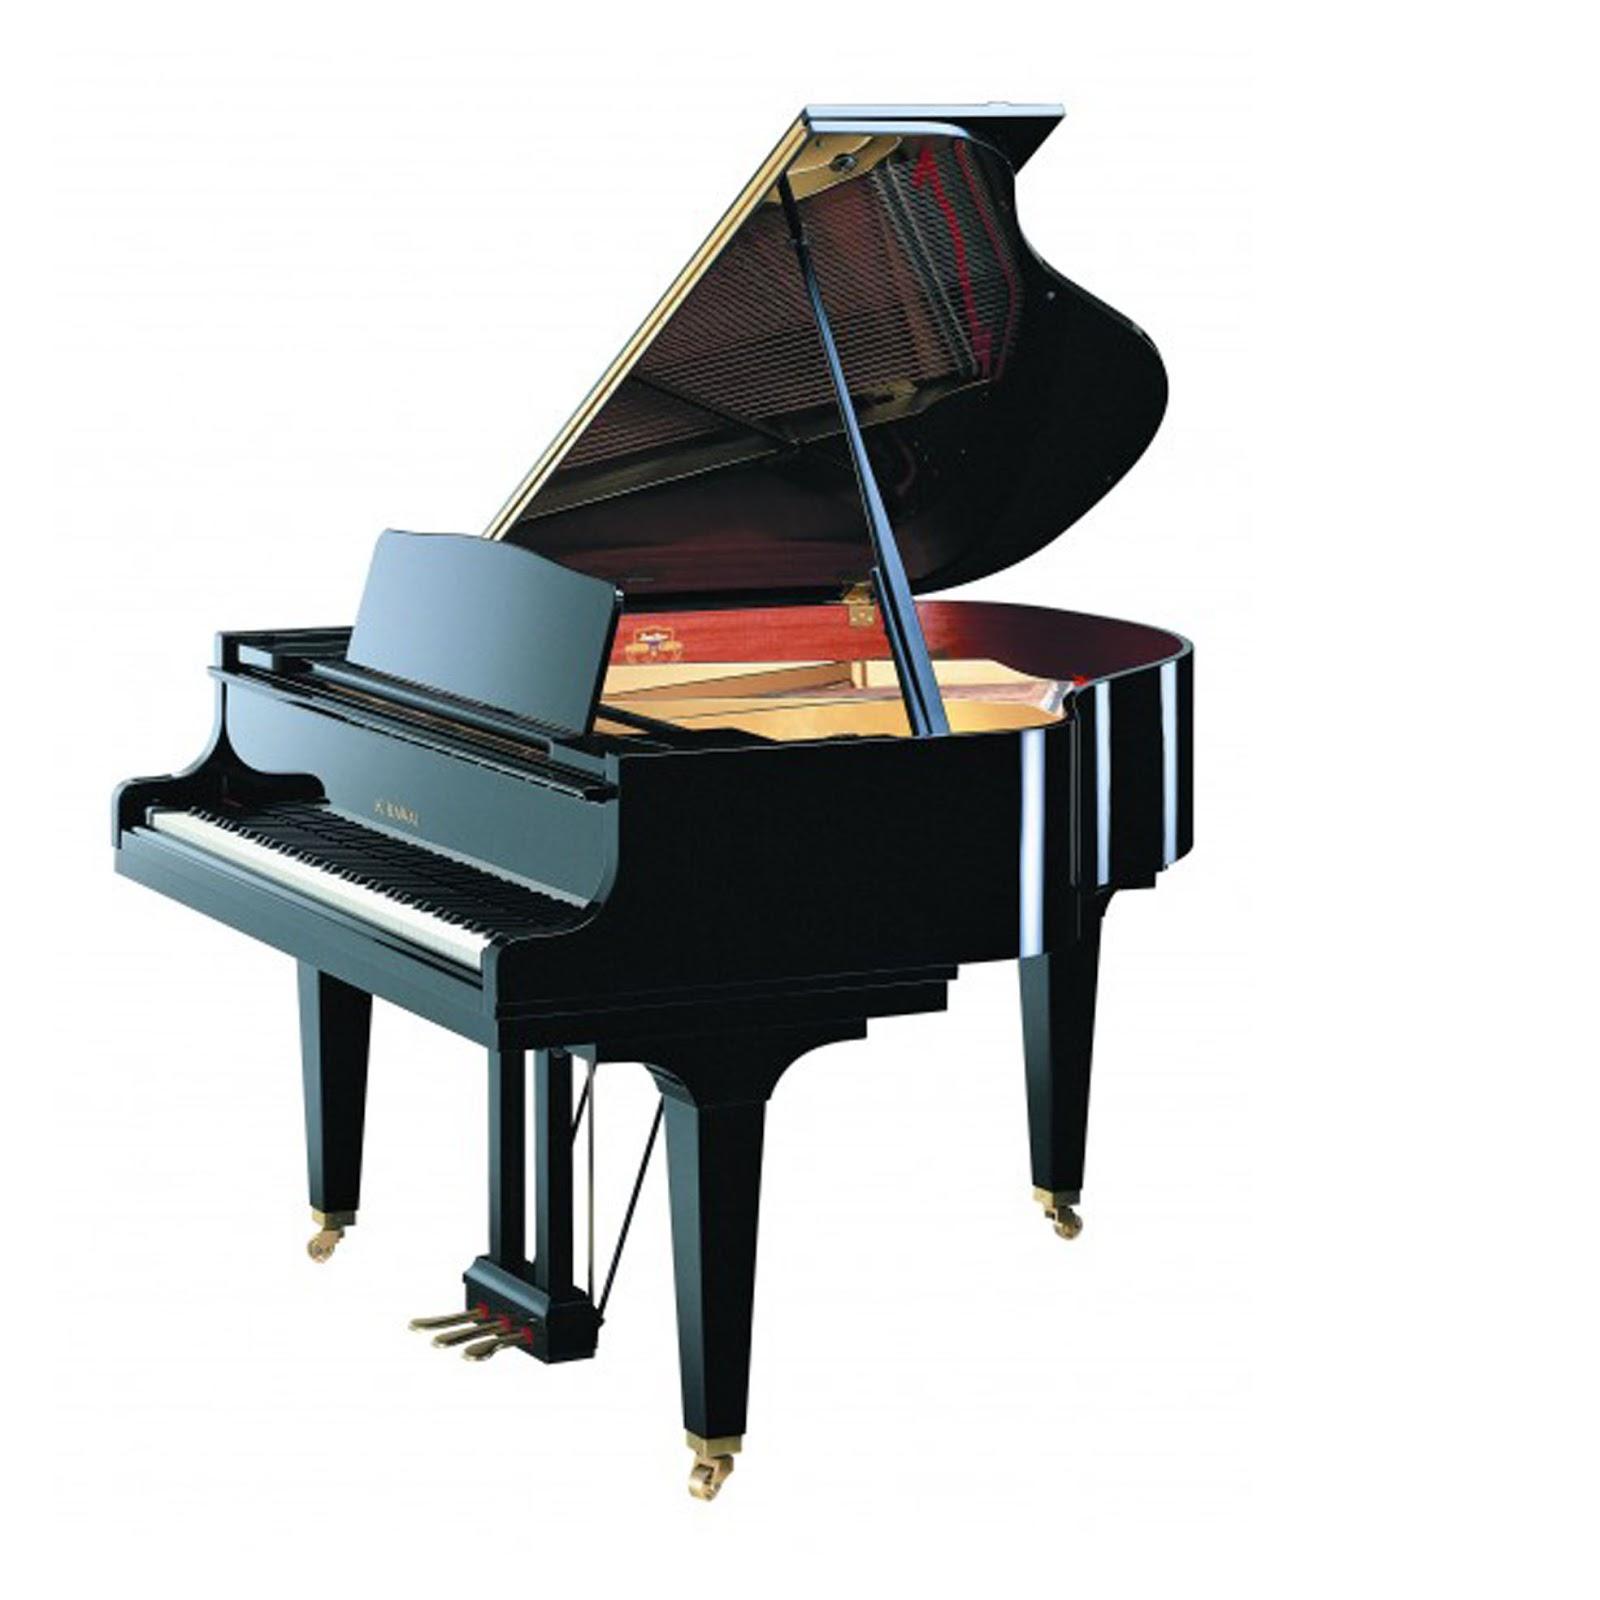 piano kawai brandnew GE-30G